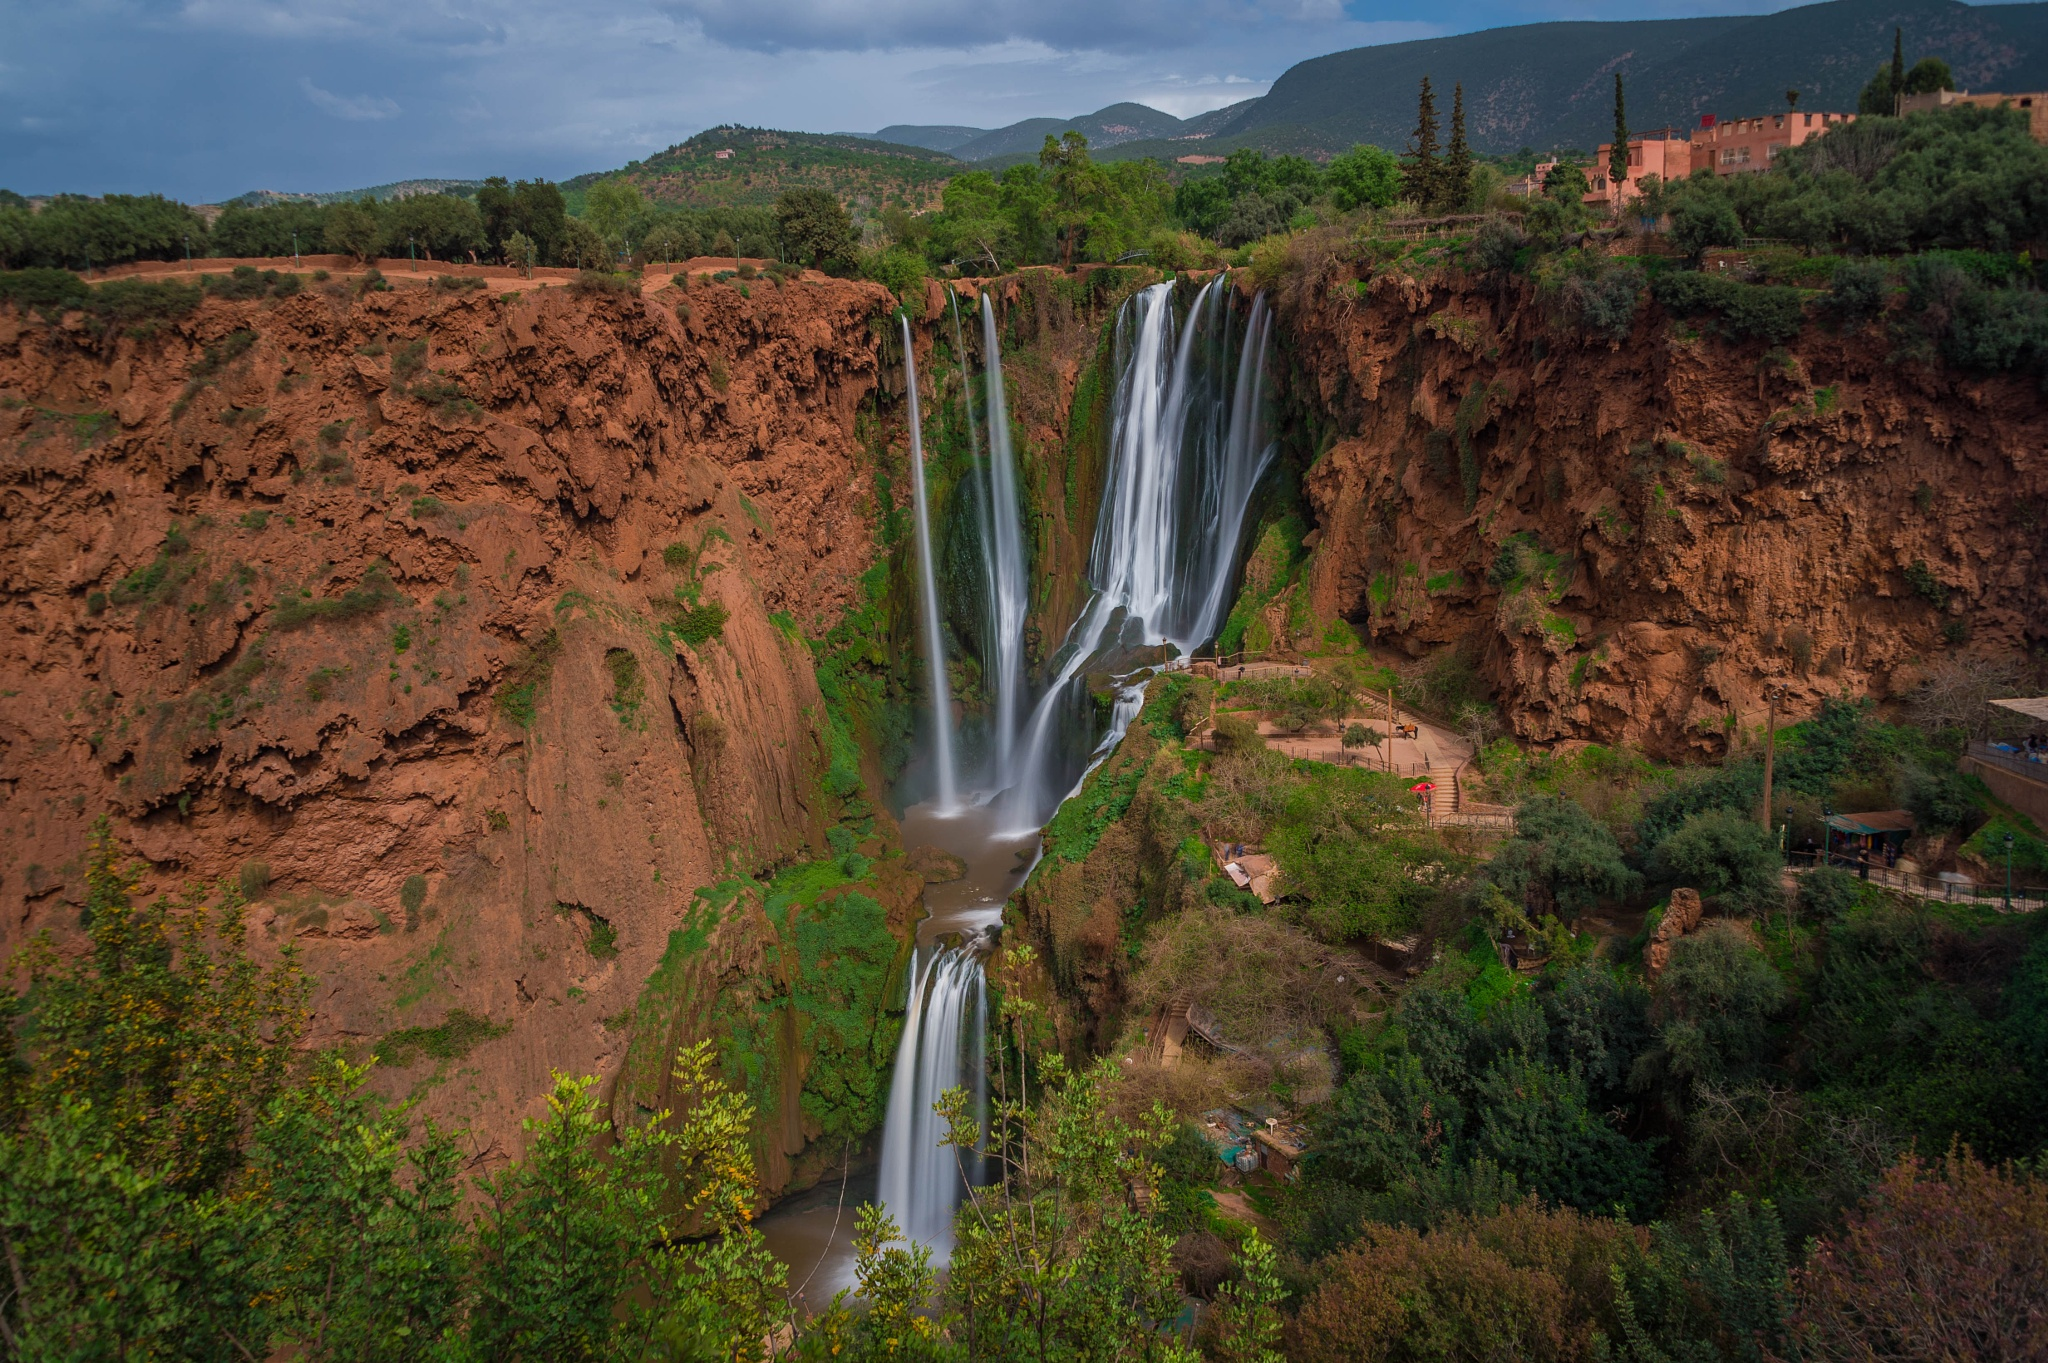 #cascadesouzoud #benimellal #morocco by MohamedBachirBennani